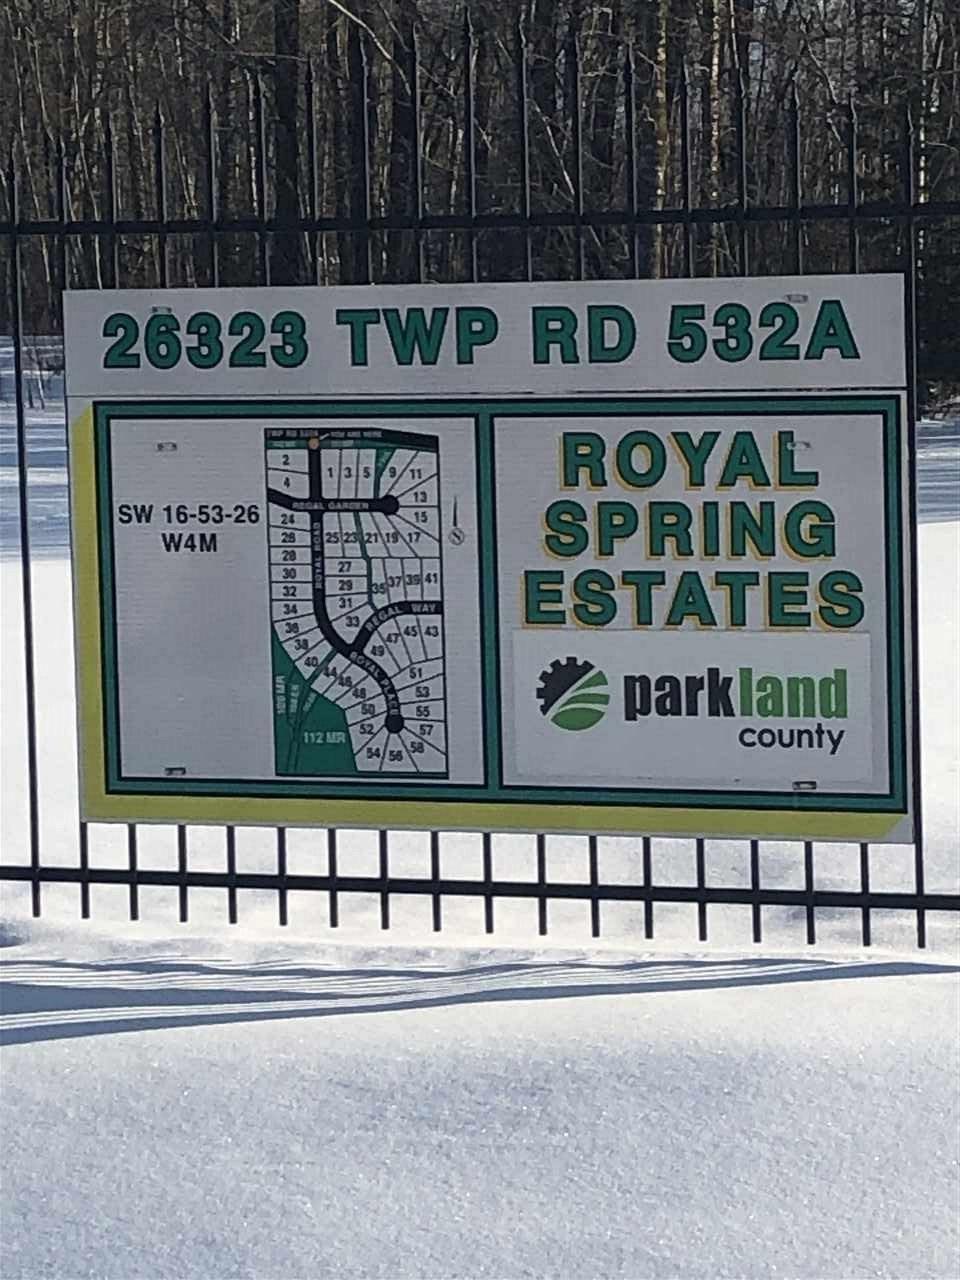 26323 TWP RD 532 A, at $275,000